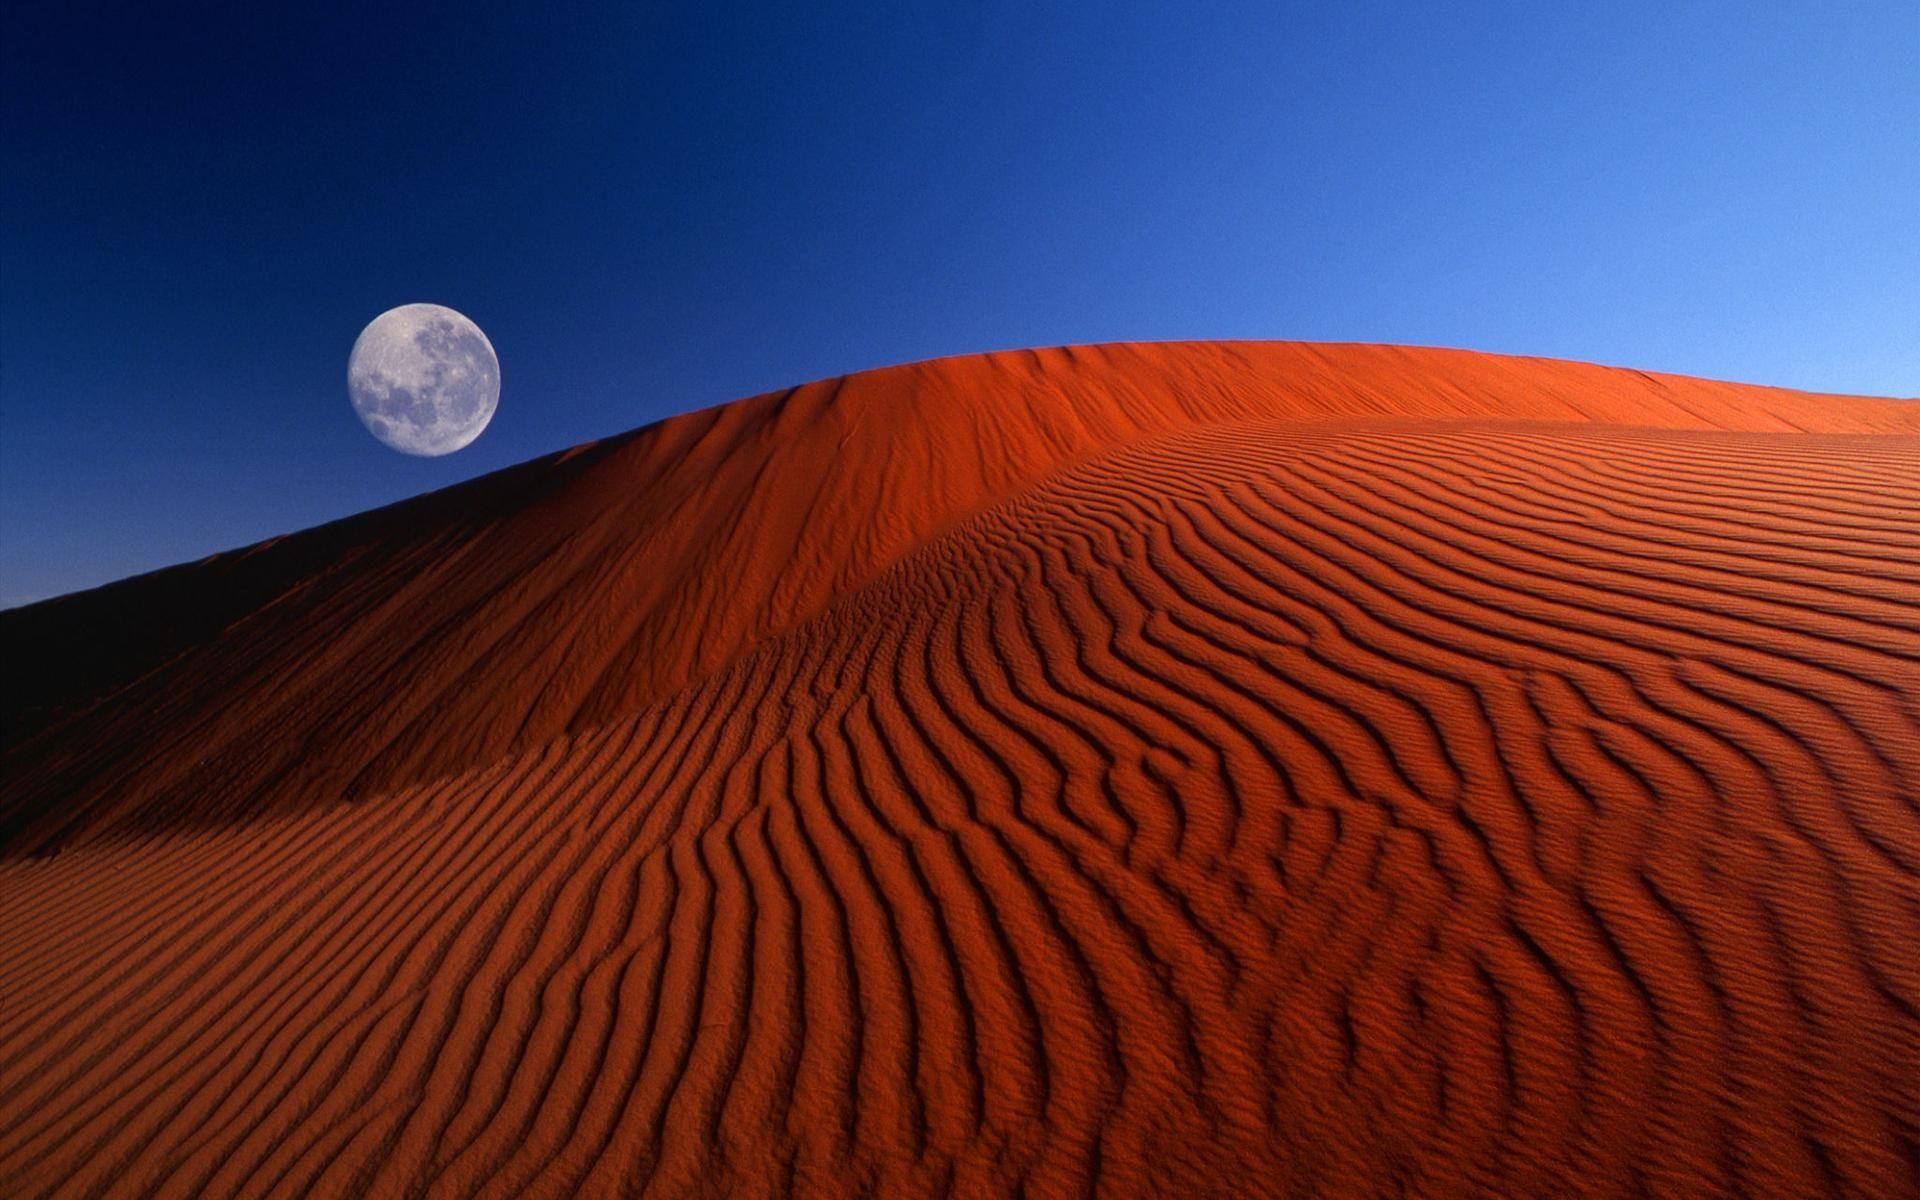 Windows Xp Red Moon Desert 1920x1200 In 2020 Desert Aesthetic Nature Photography Nature Wallpaper